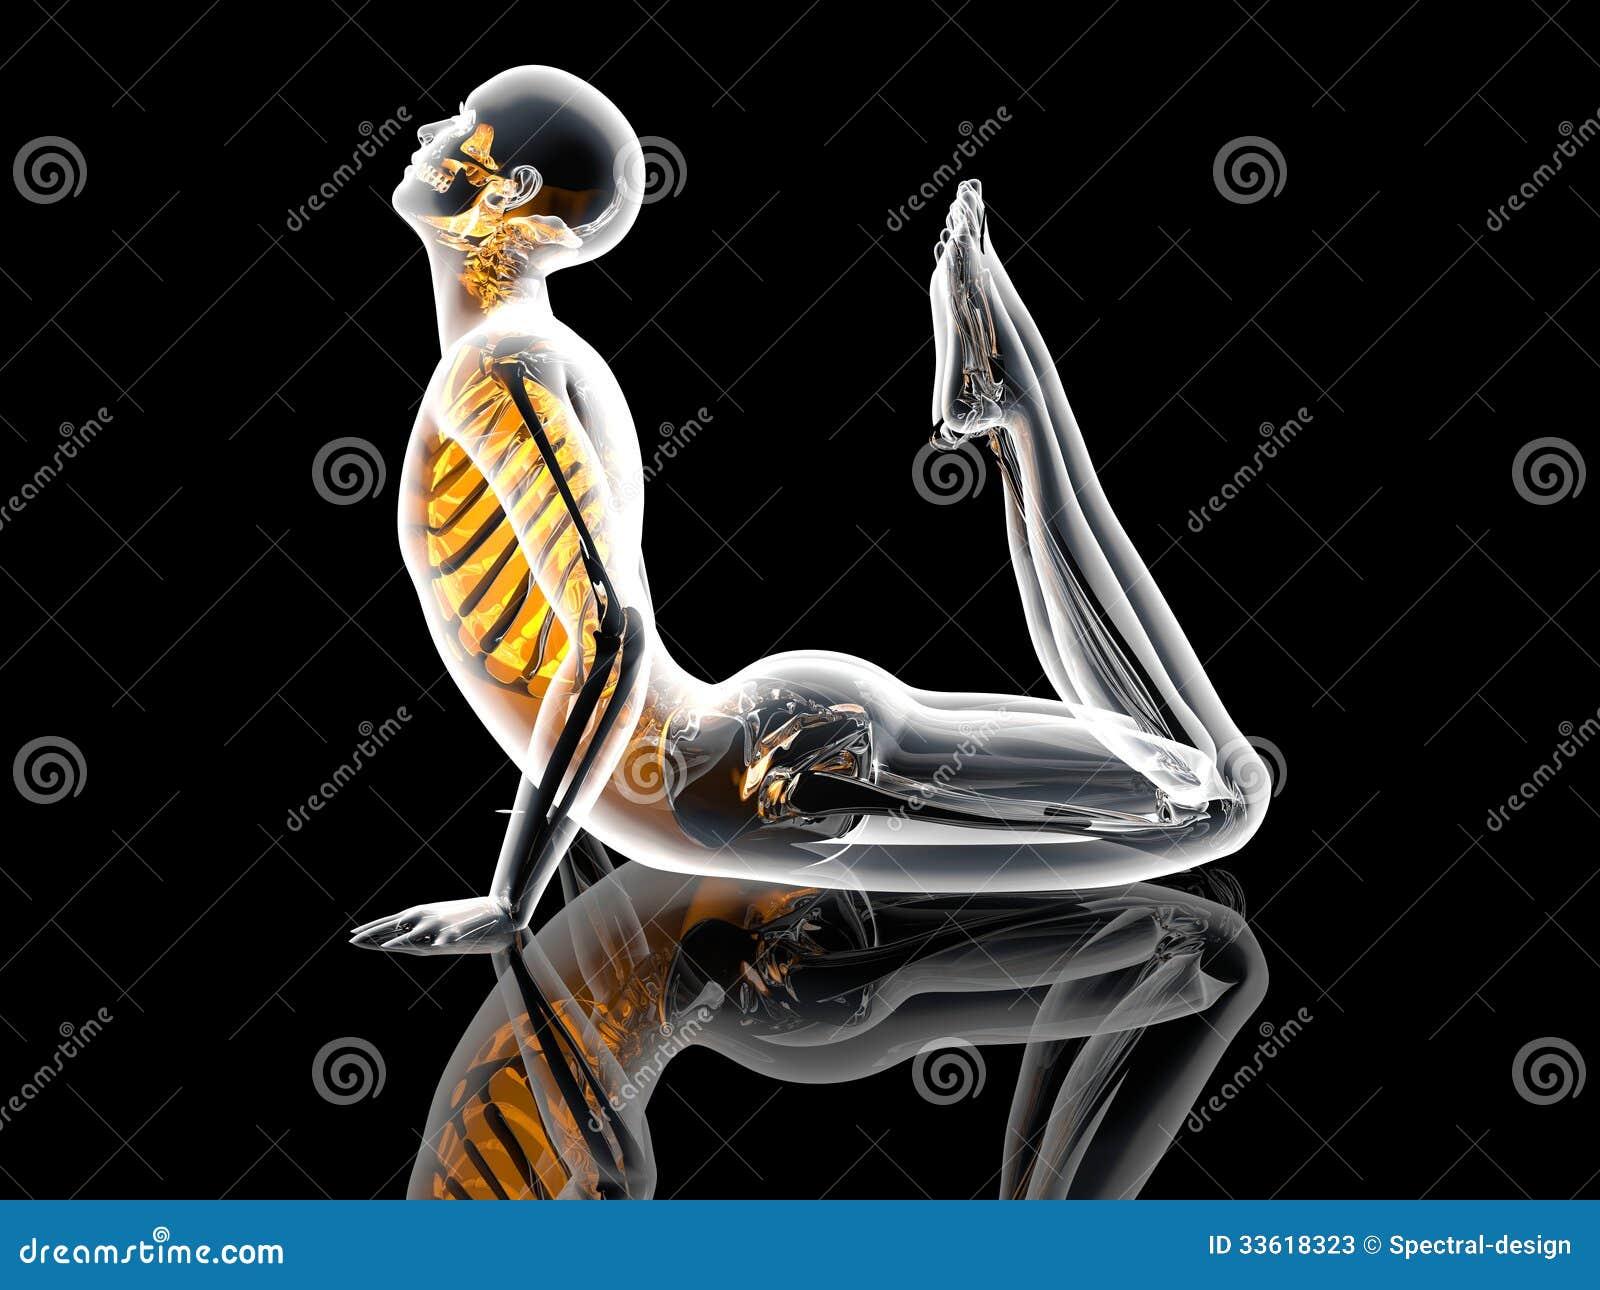 Yoga Pose - King Cobra stock illustration. Illustration of bright ...